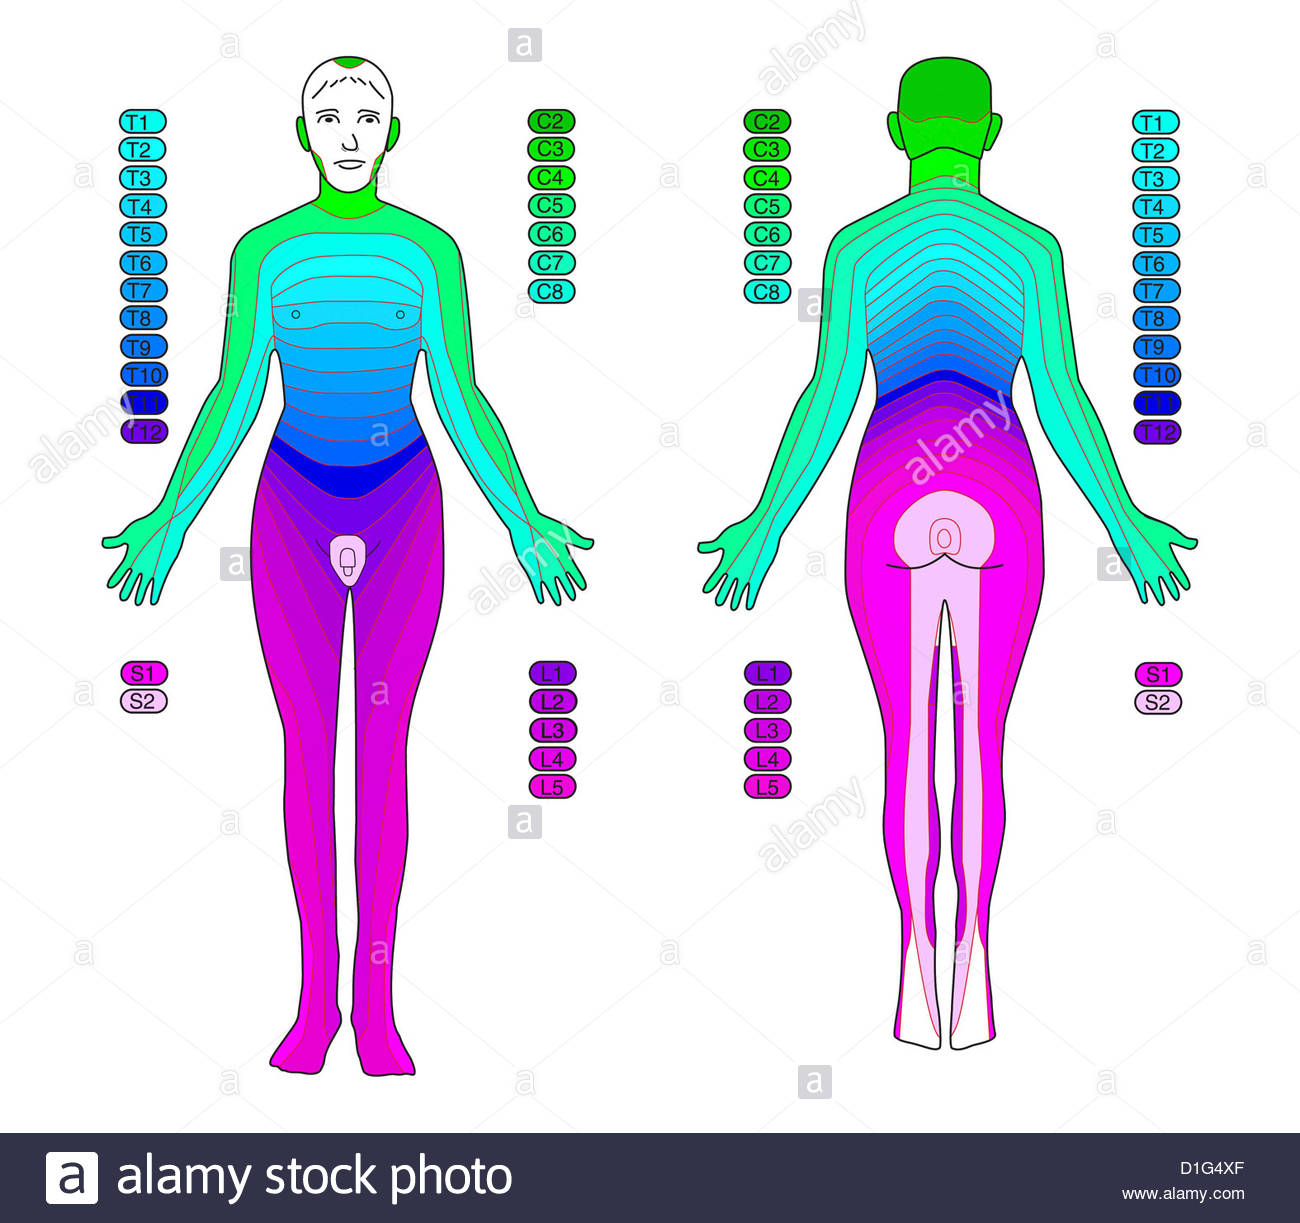 l4 nerve pain diagram dna structure labeled illustration dermatomes stock photo 52600871 alamy